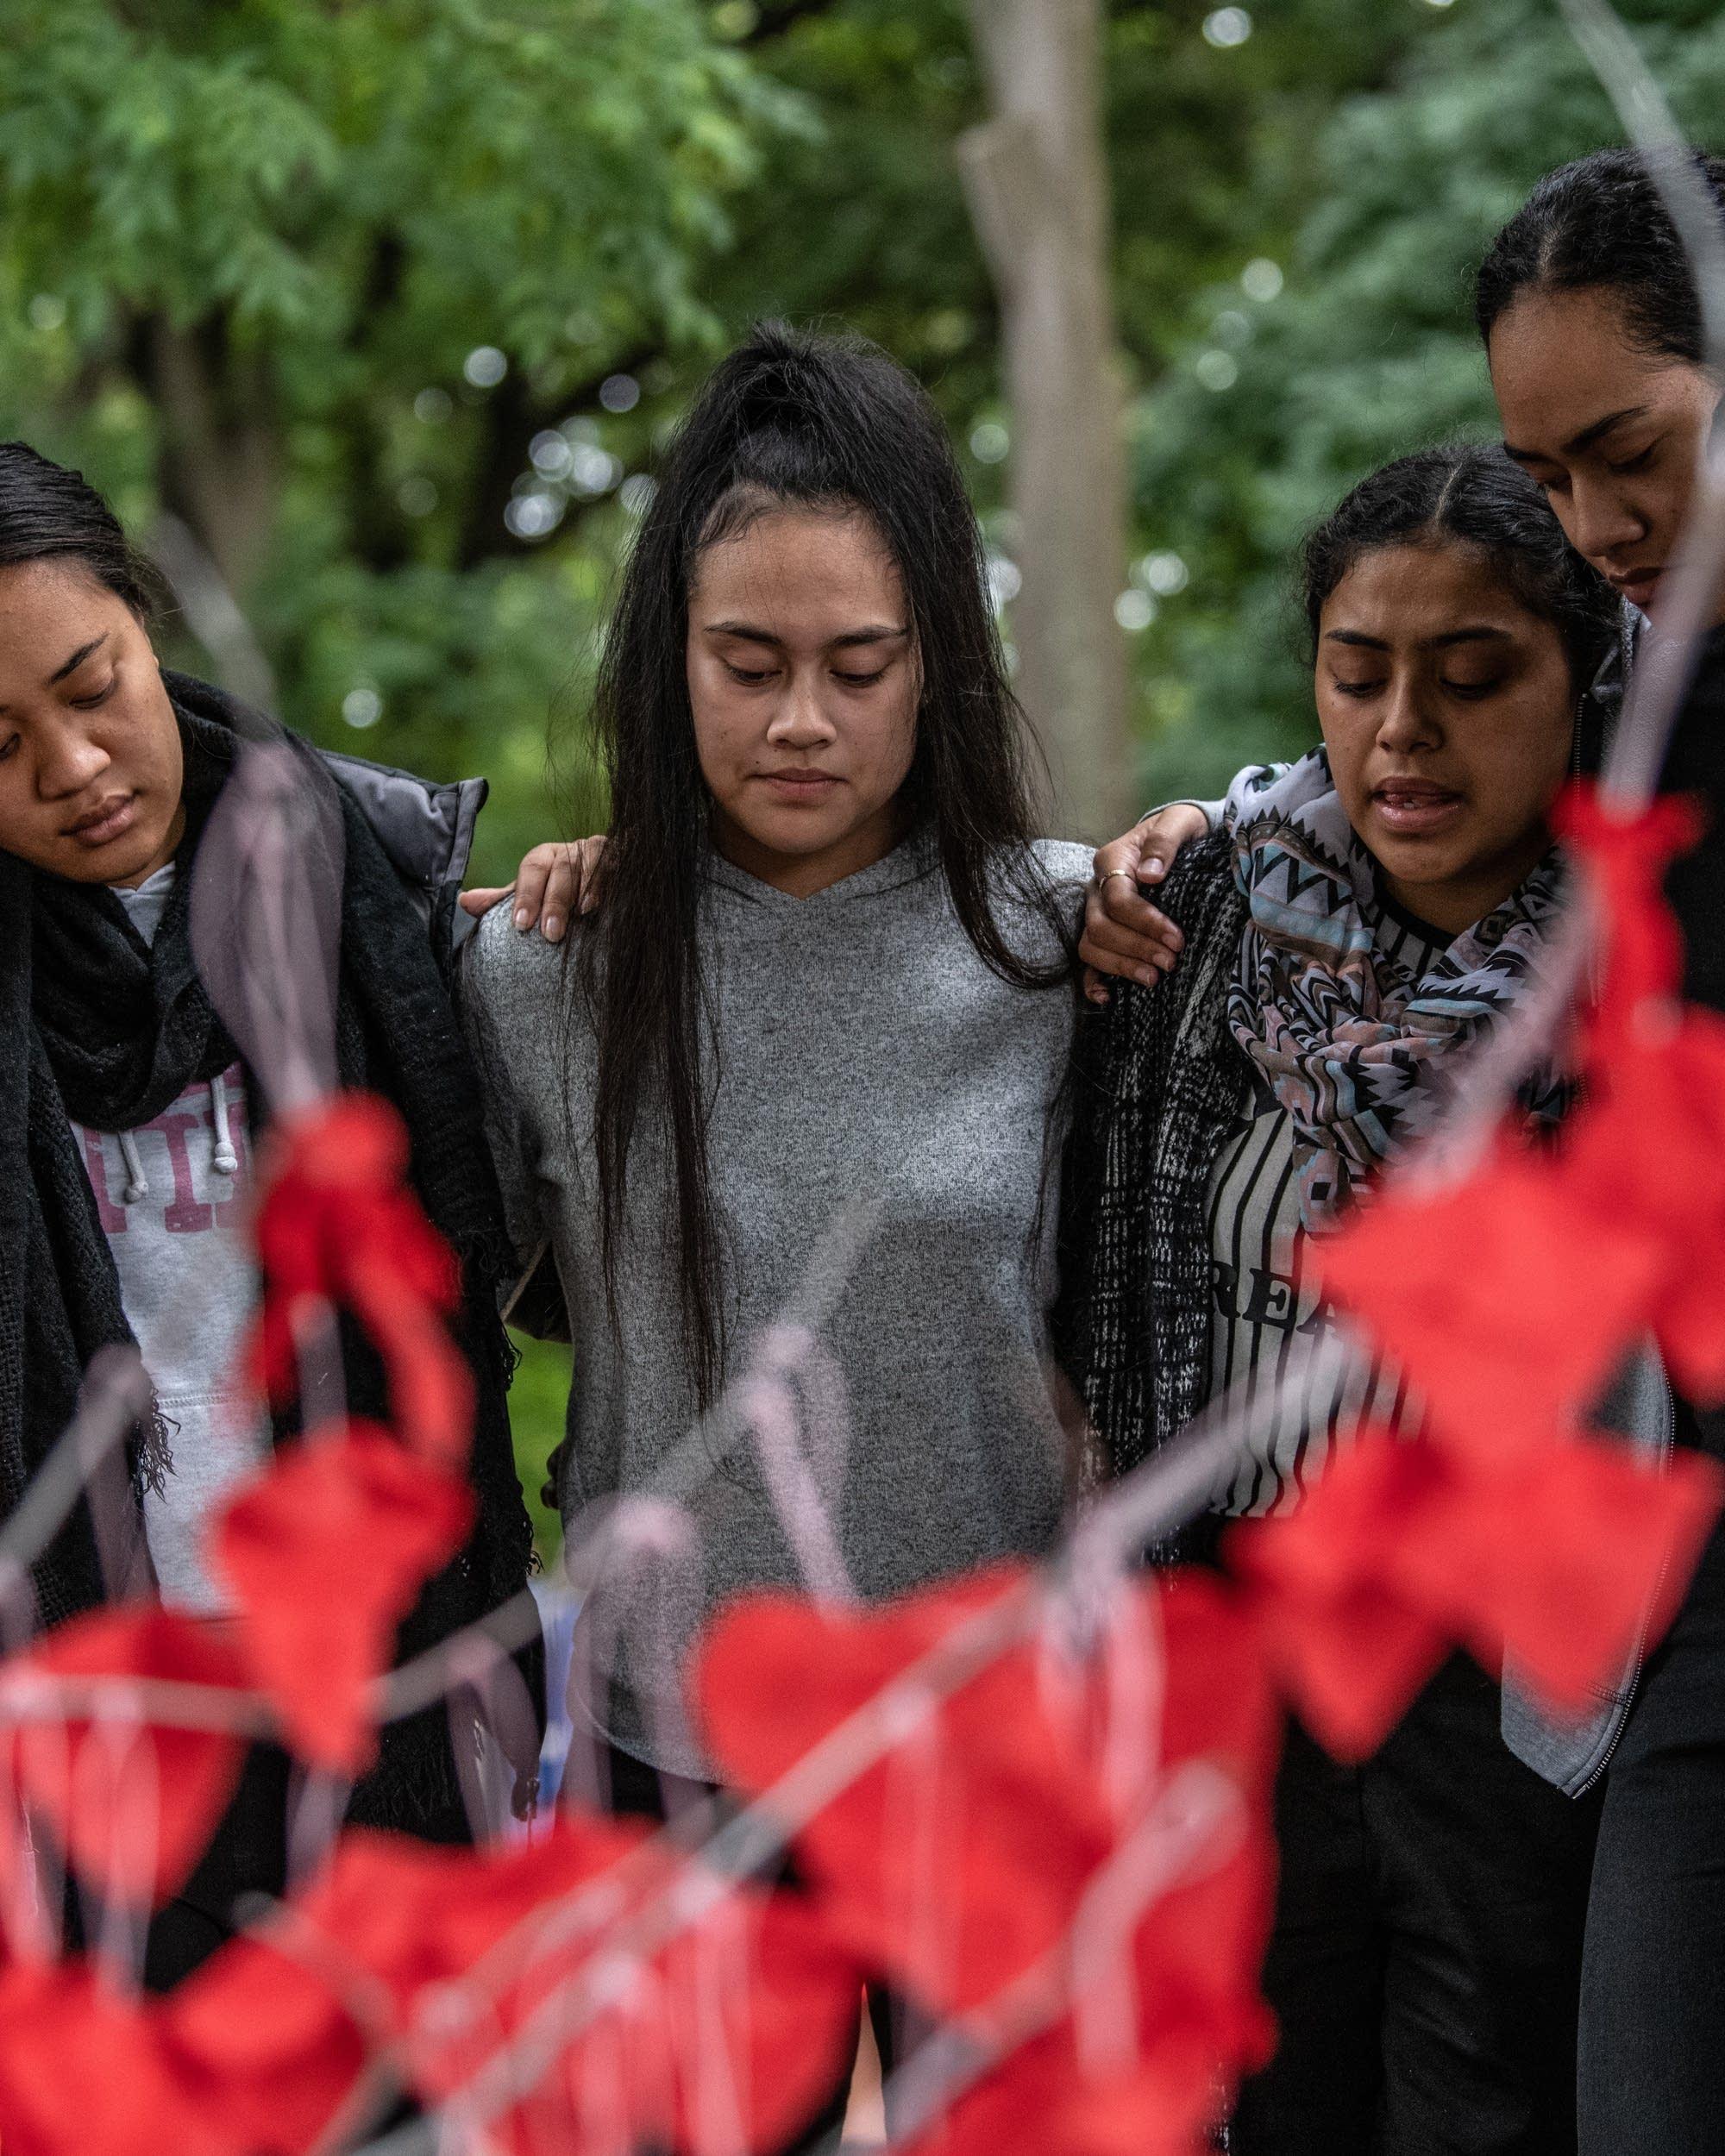 Christchurch gun shop sold rifles online to accused shooter | MPR News